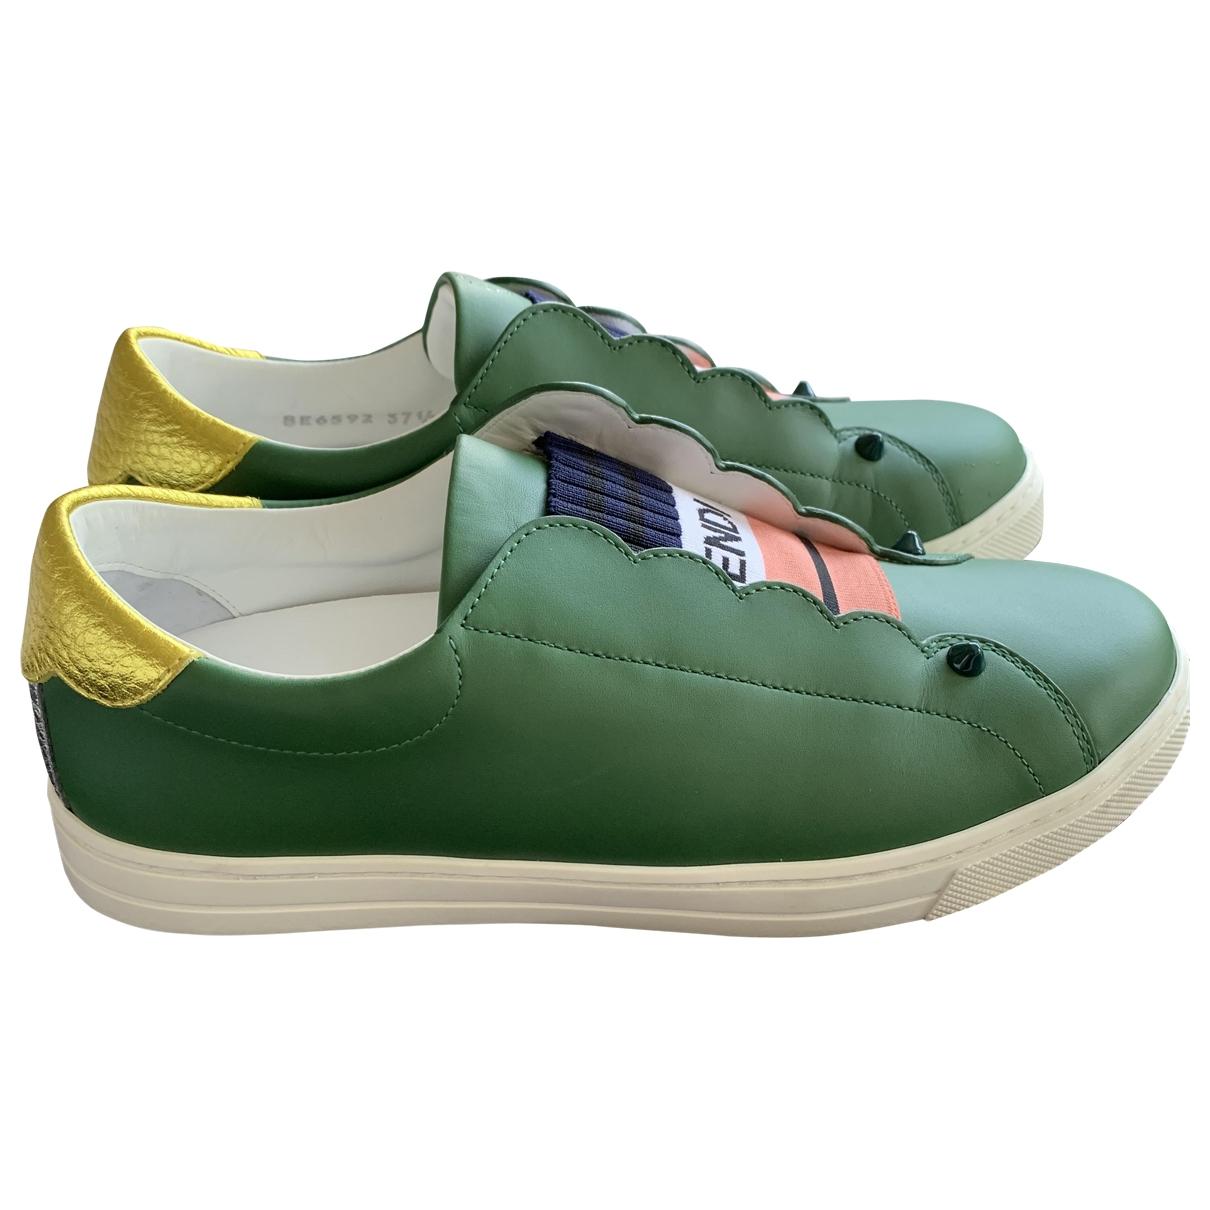 Fendi \N Sneakers in  Gruen Leder